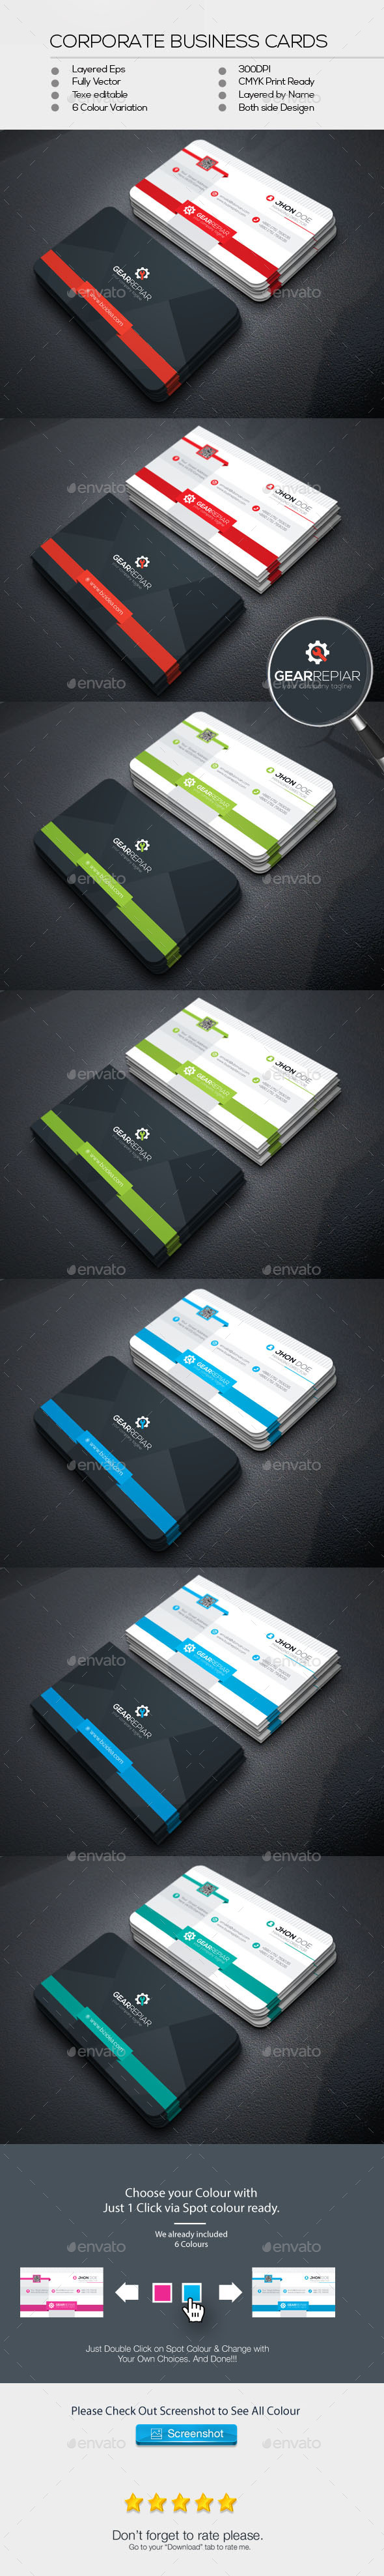 GearRapier Business Cards